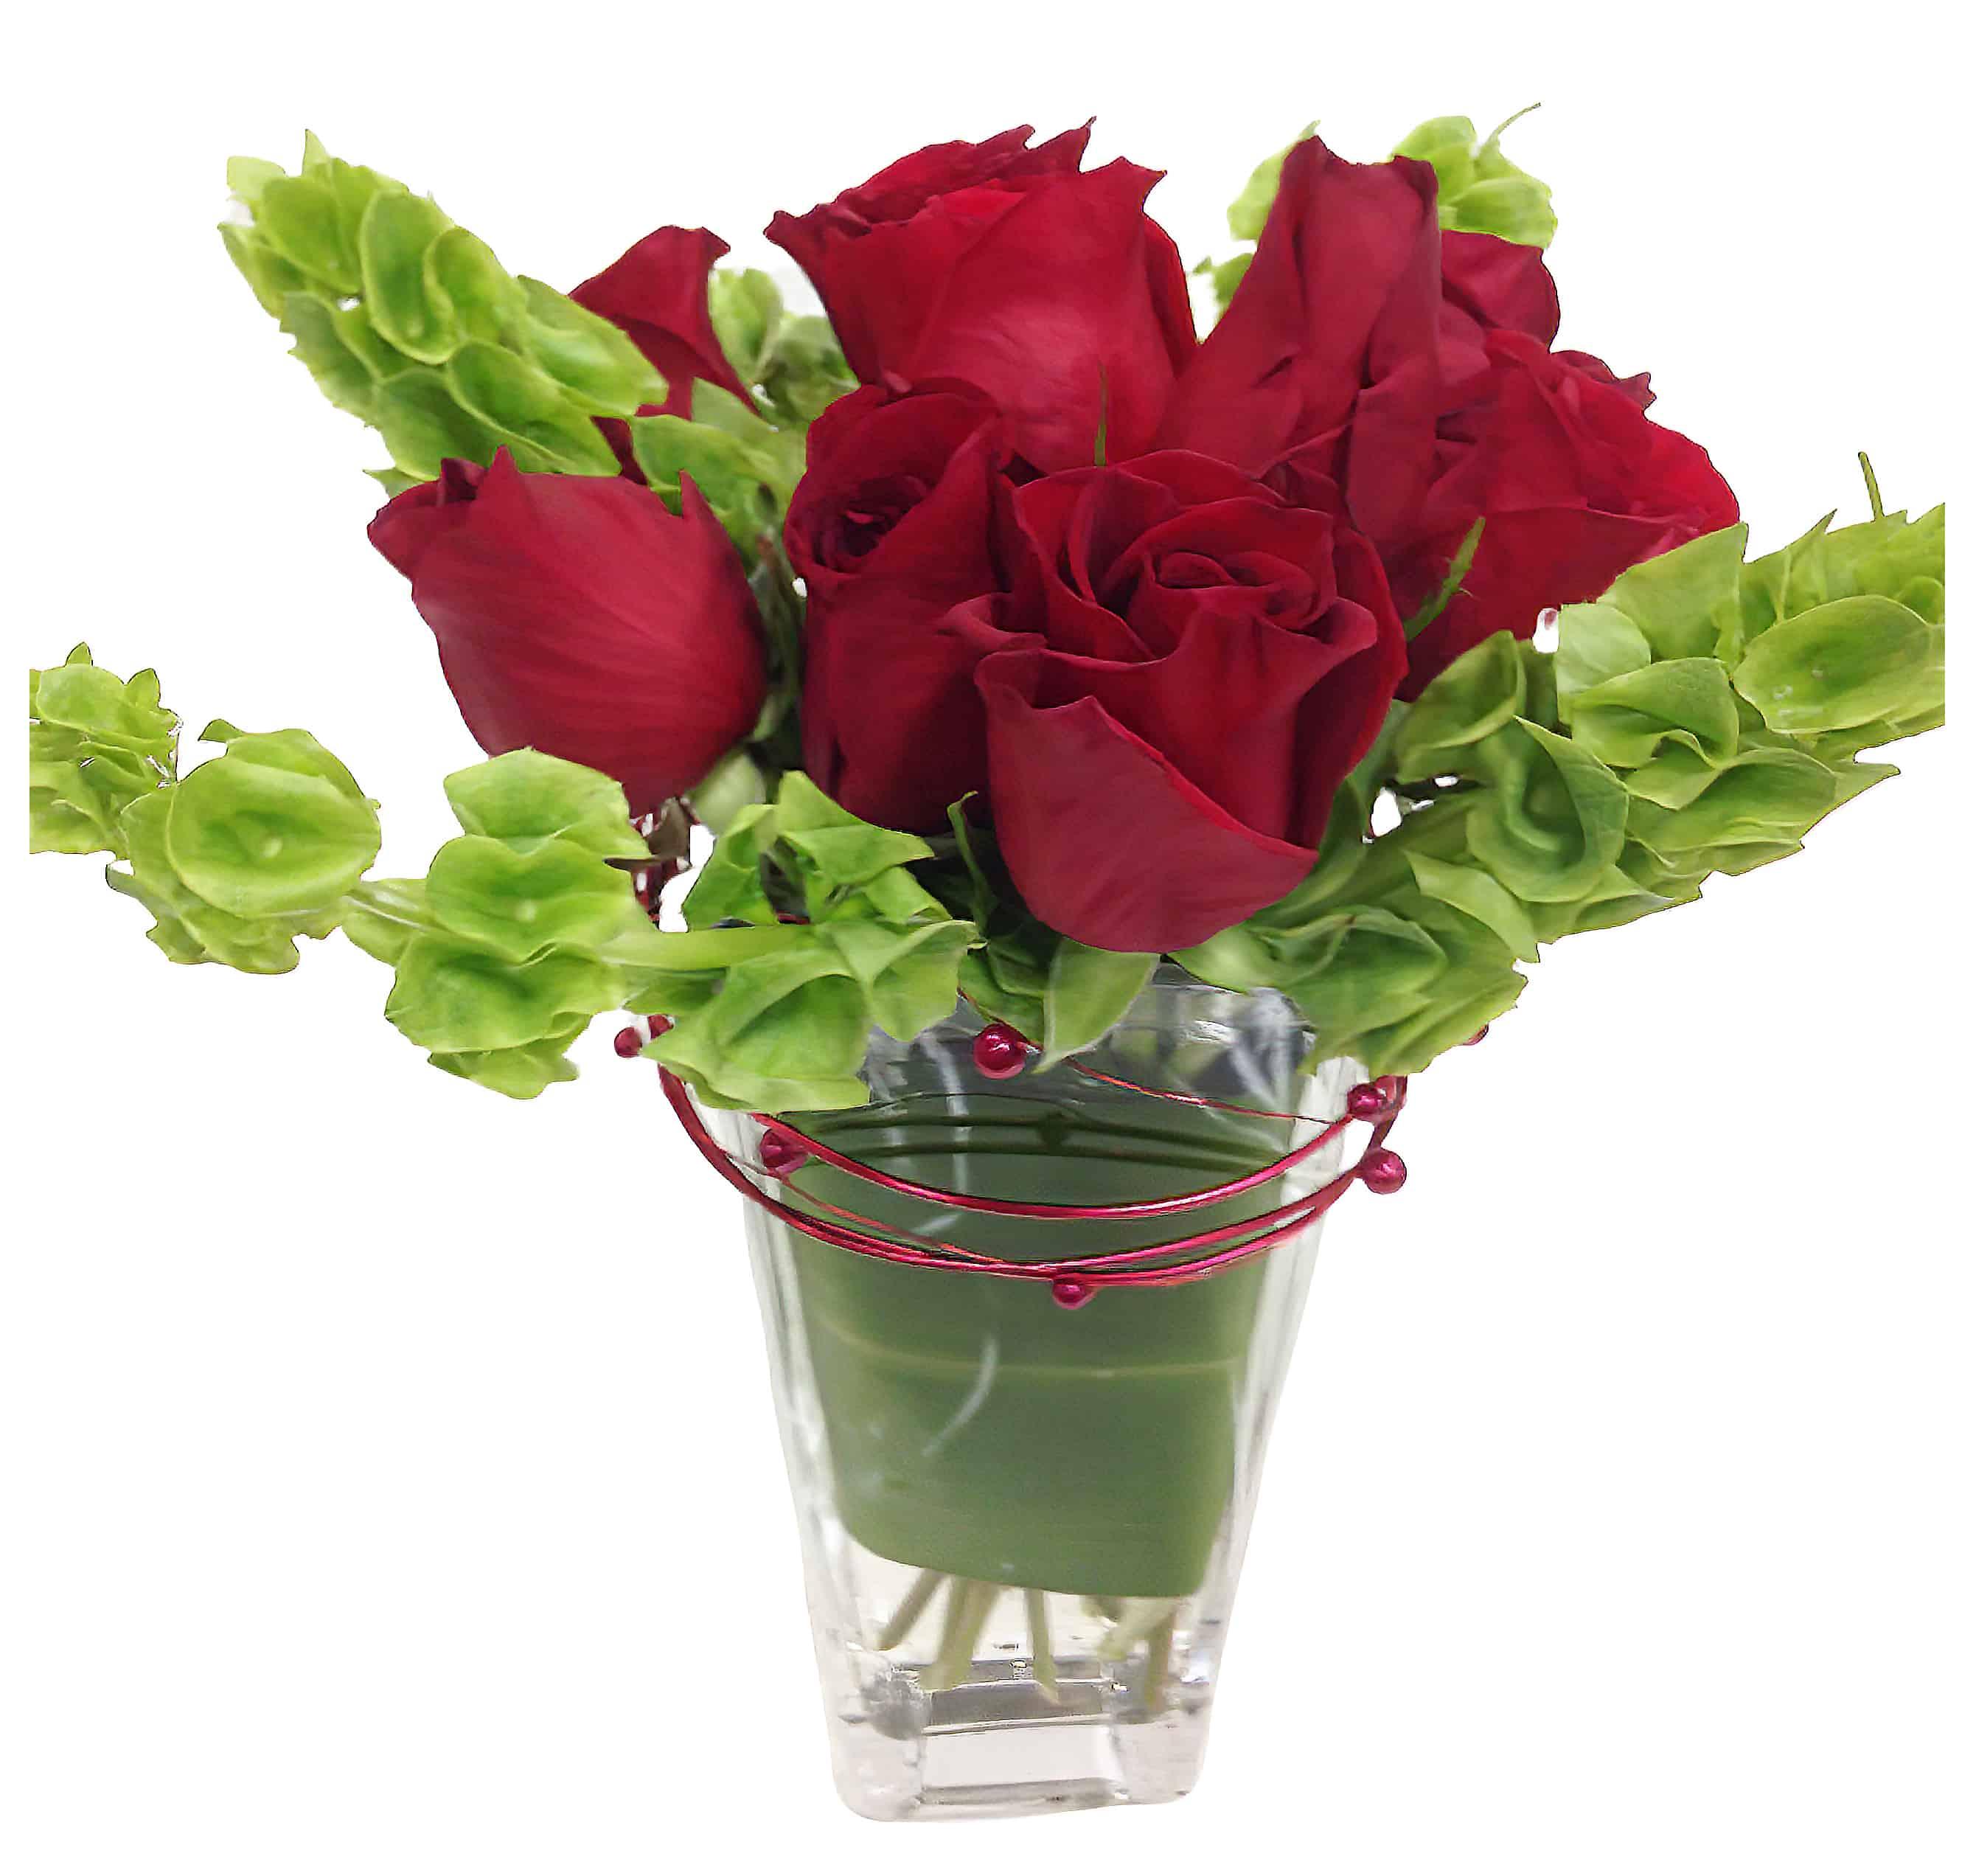 Topsy Turvy Roses Flower Arrangement